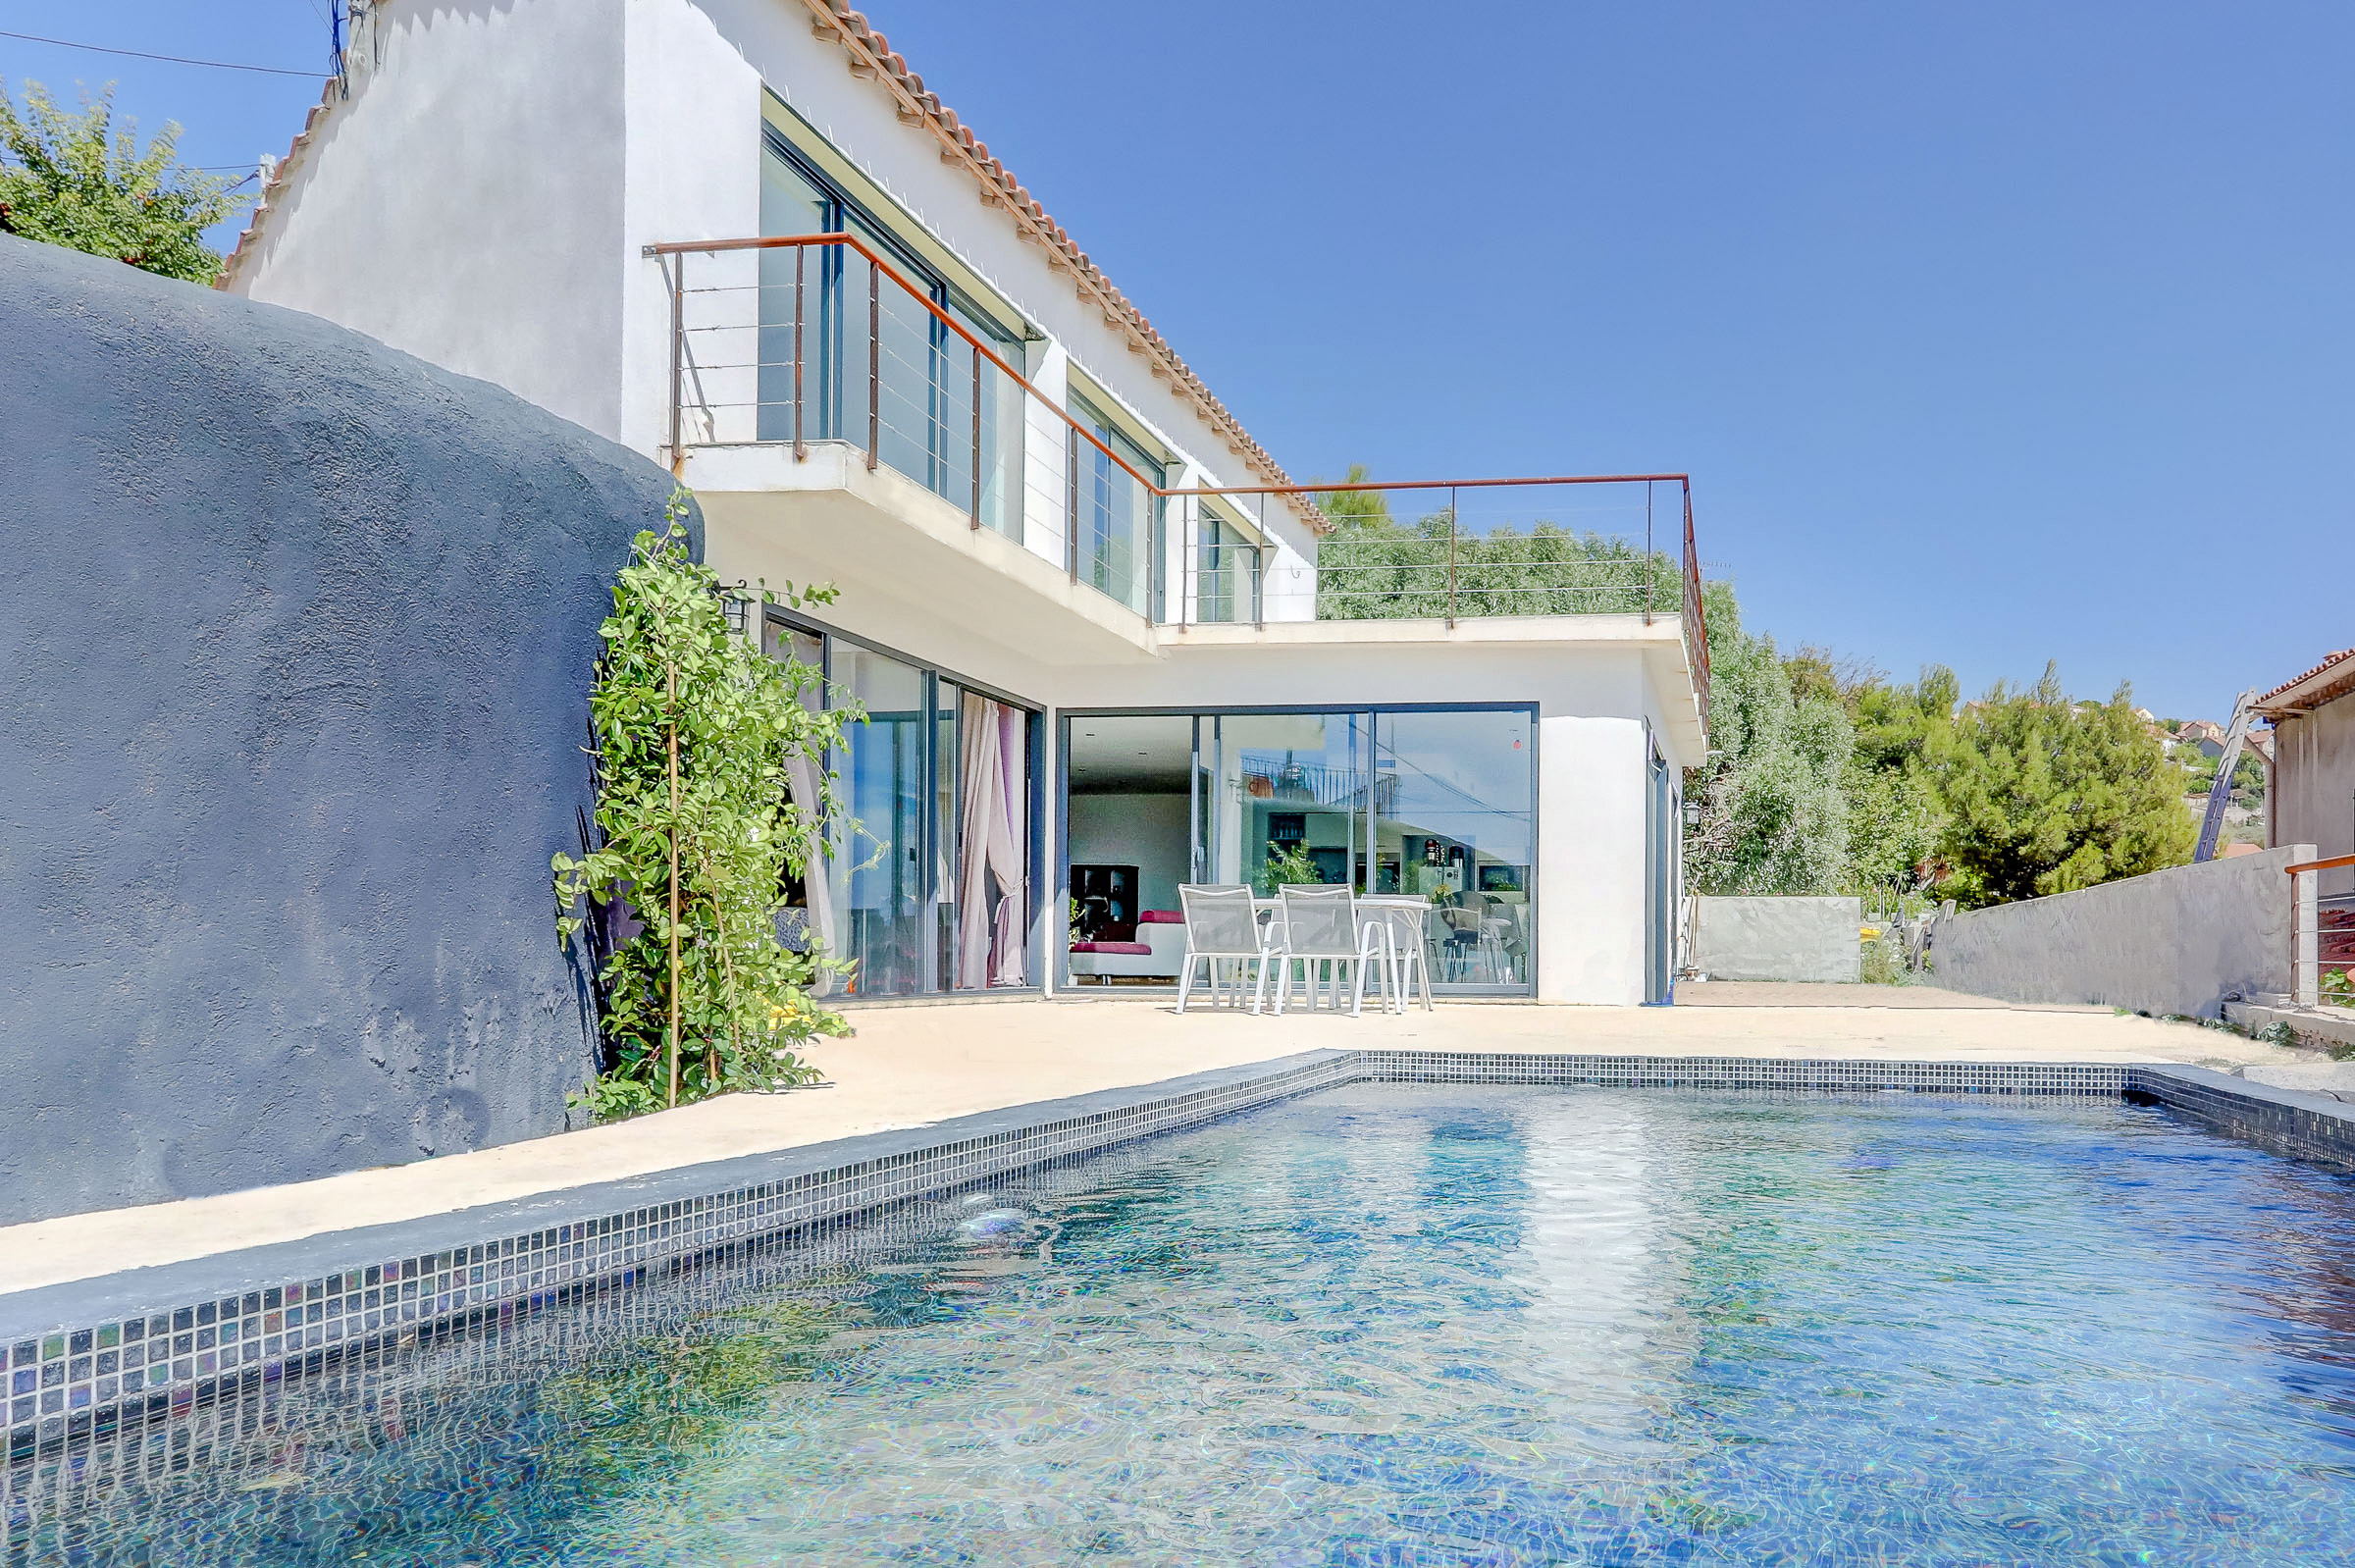 ma-terrasse-a-marseille-maison-piscine-vue-mer-13006-6